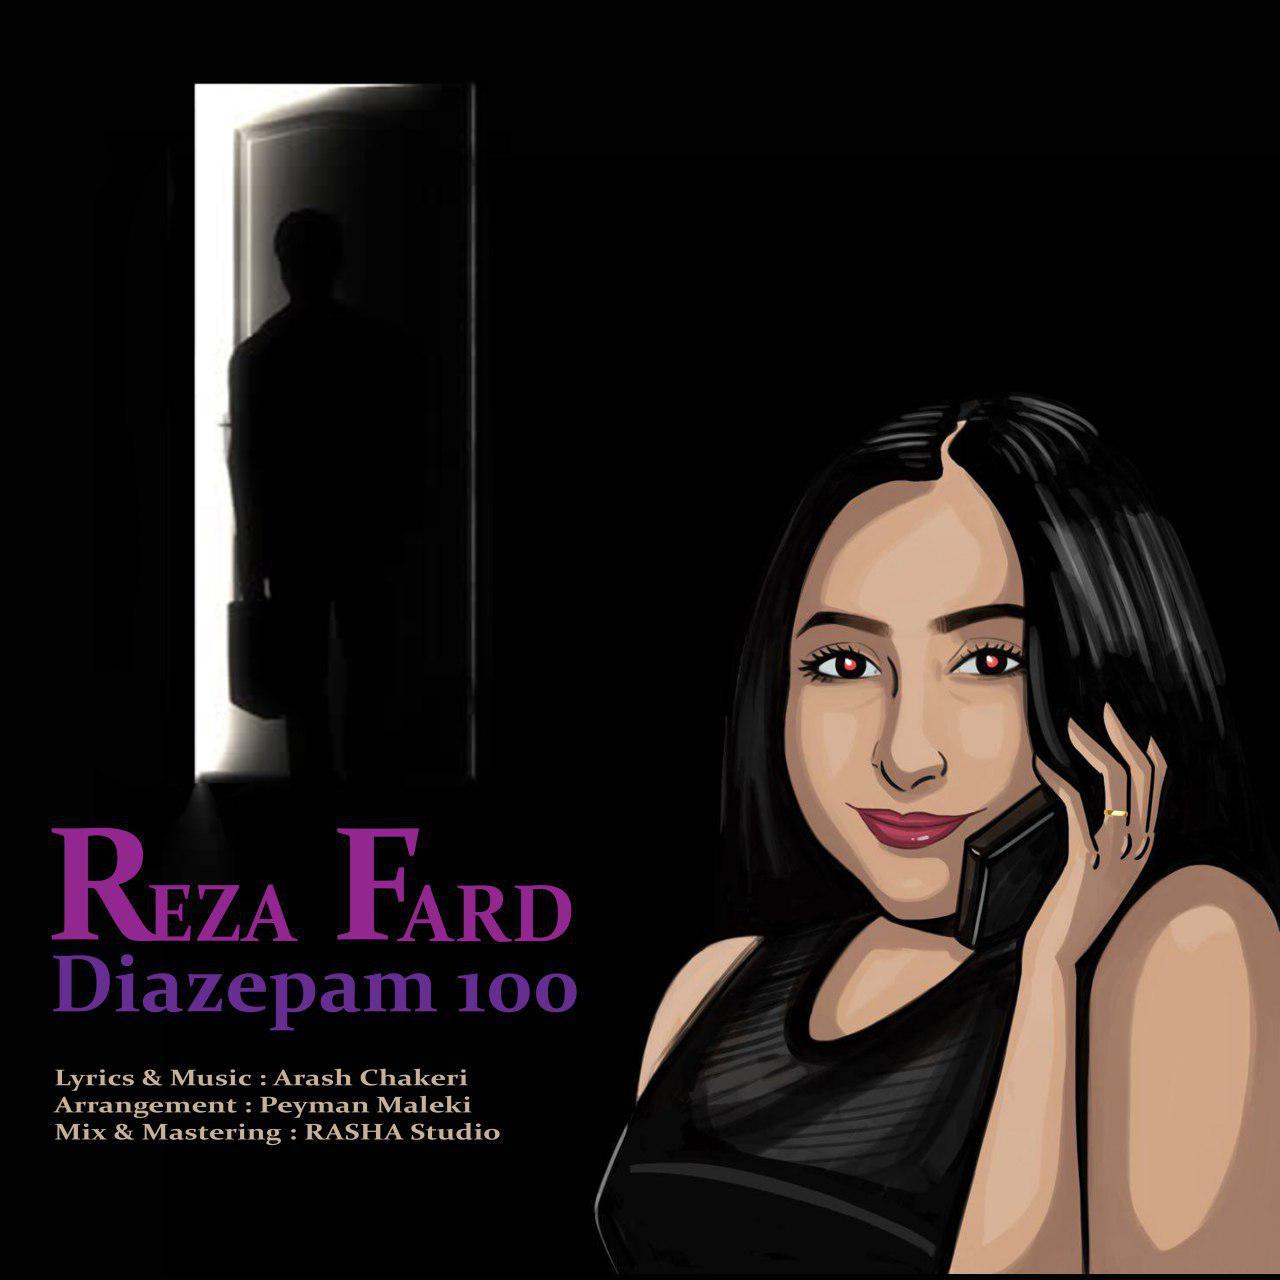 Reza Fard – Diazepam 100